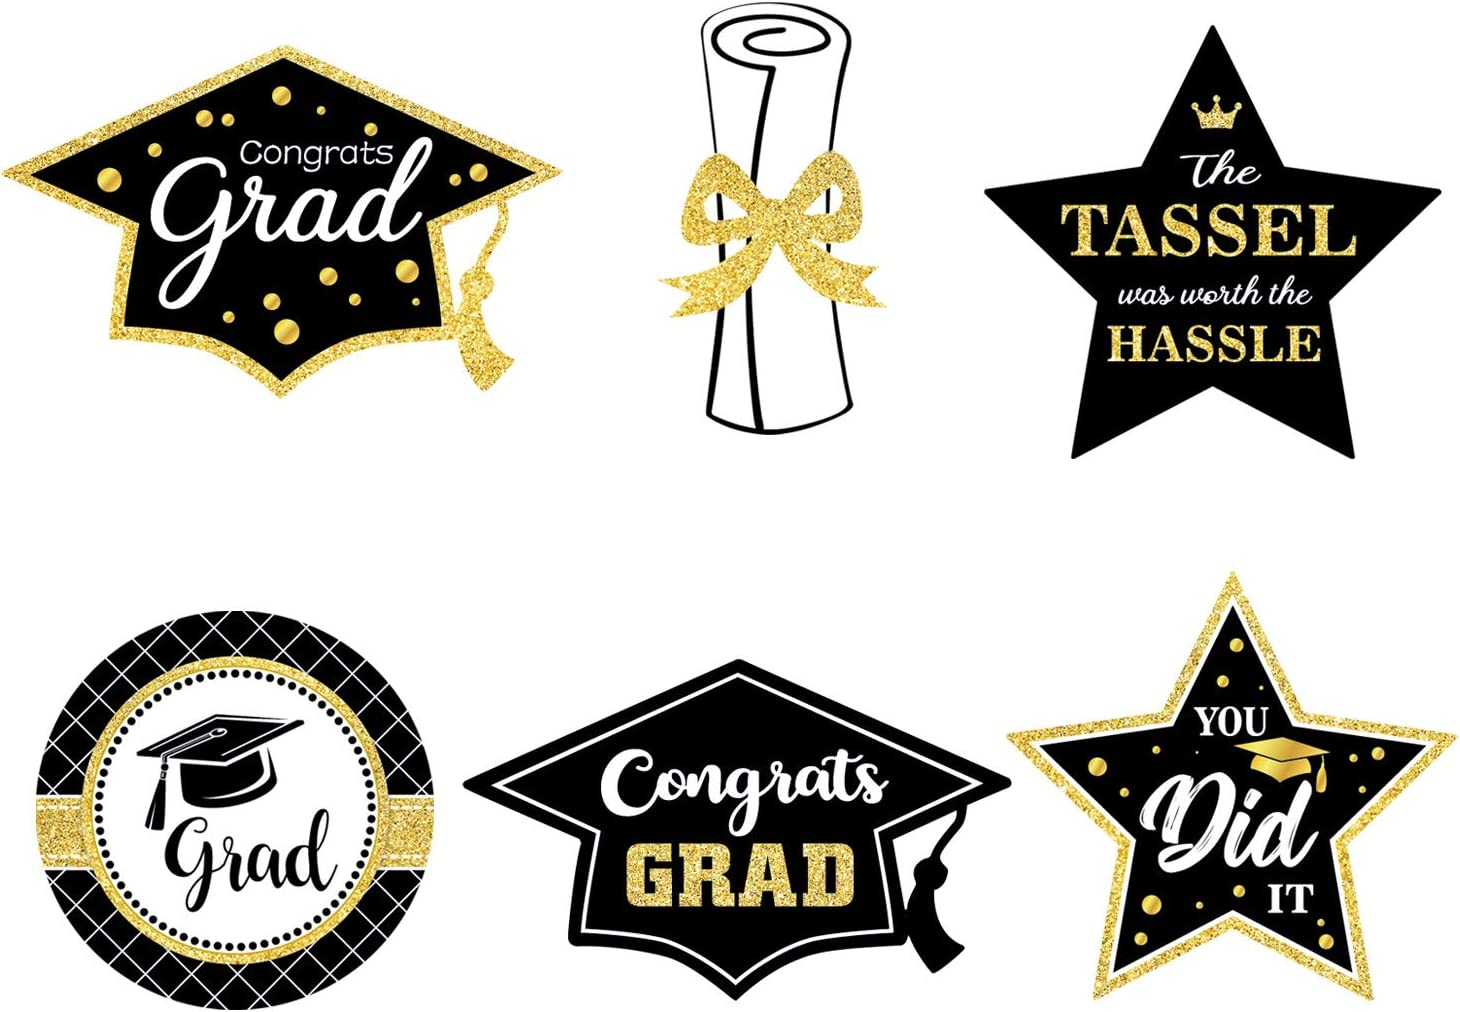 Graduation Party Favors 2021 Graduation Confetti Pack of 25 Pieces Confetti Includes Grad Cap and Star